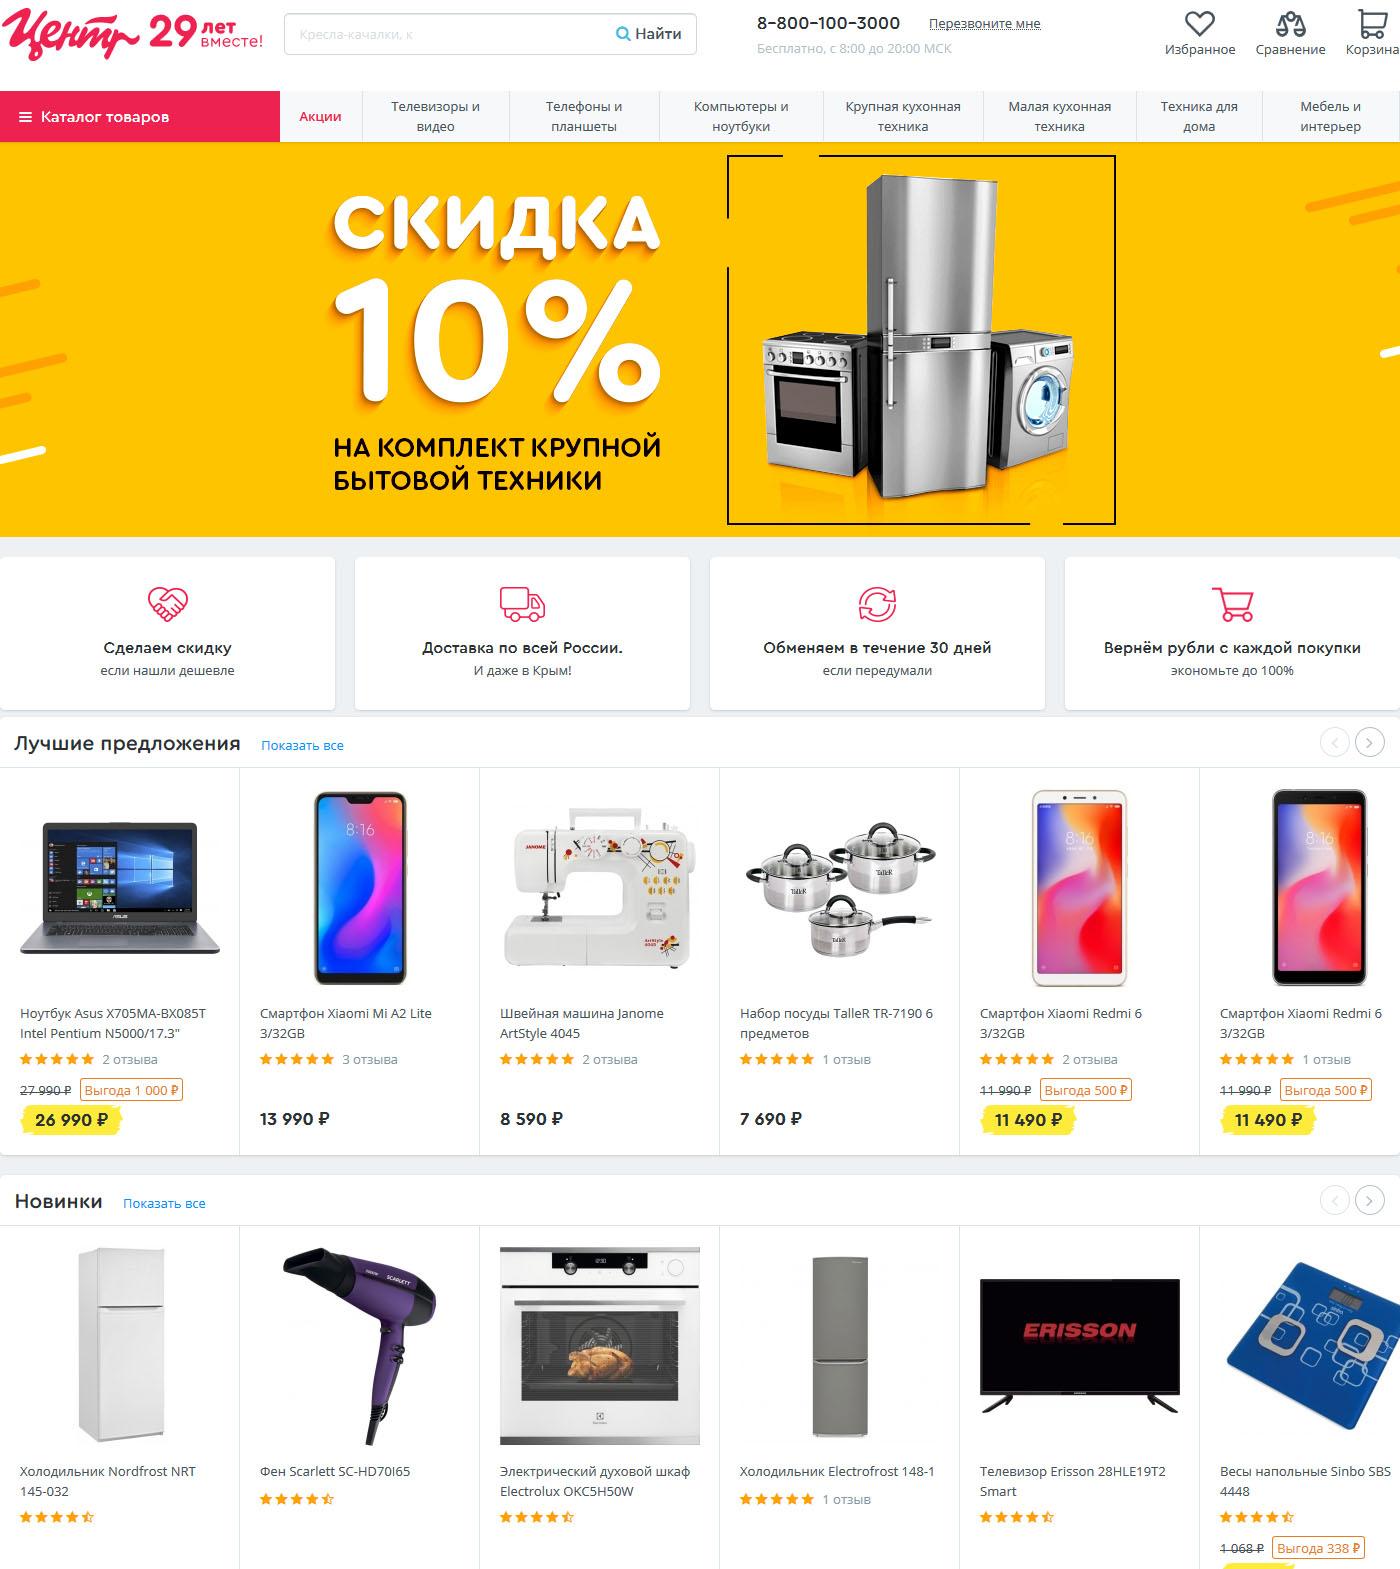 Интернет-магазин Корпорации Центр